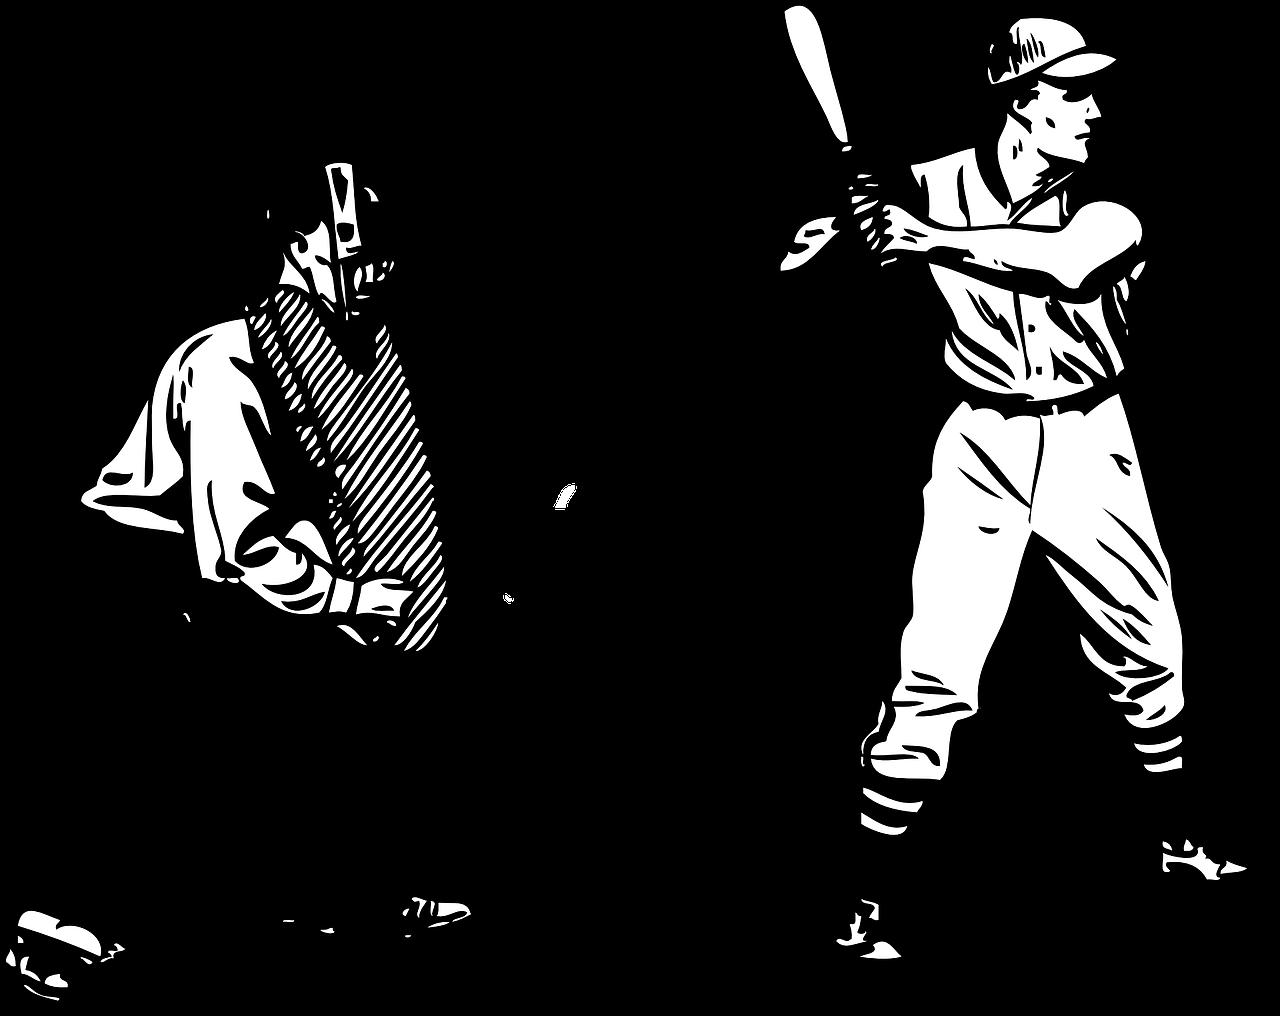 png Baseball batter backstop png. Umpire clipart cartoon